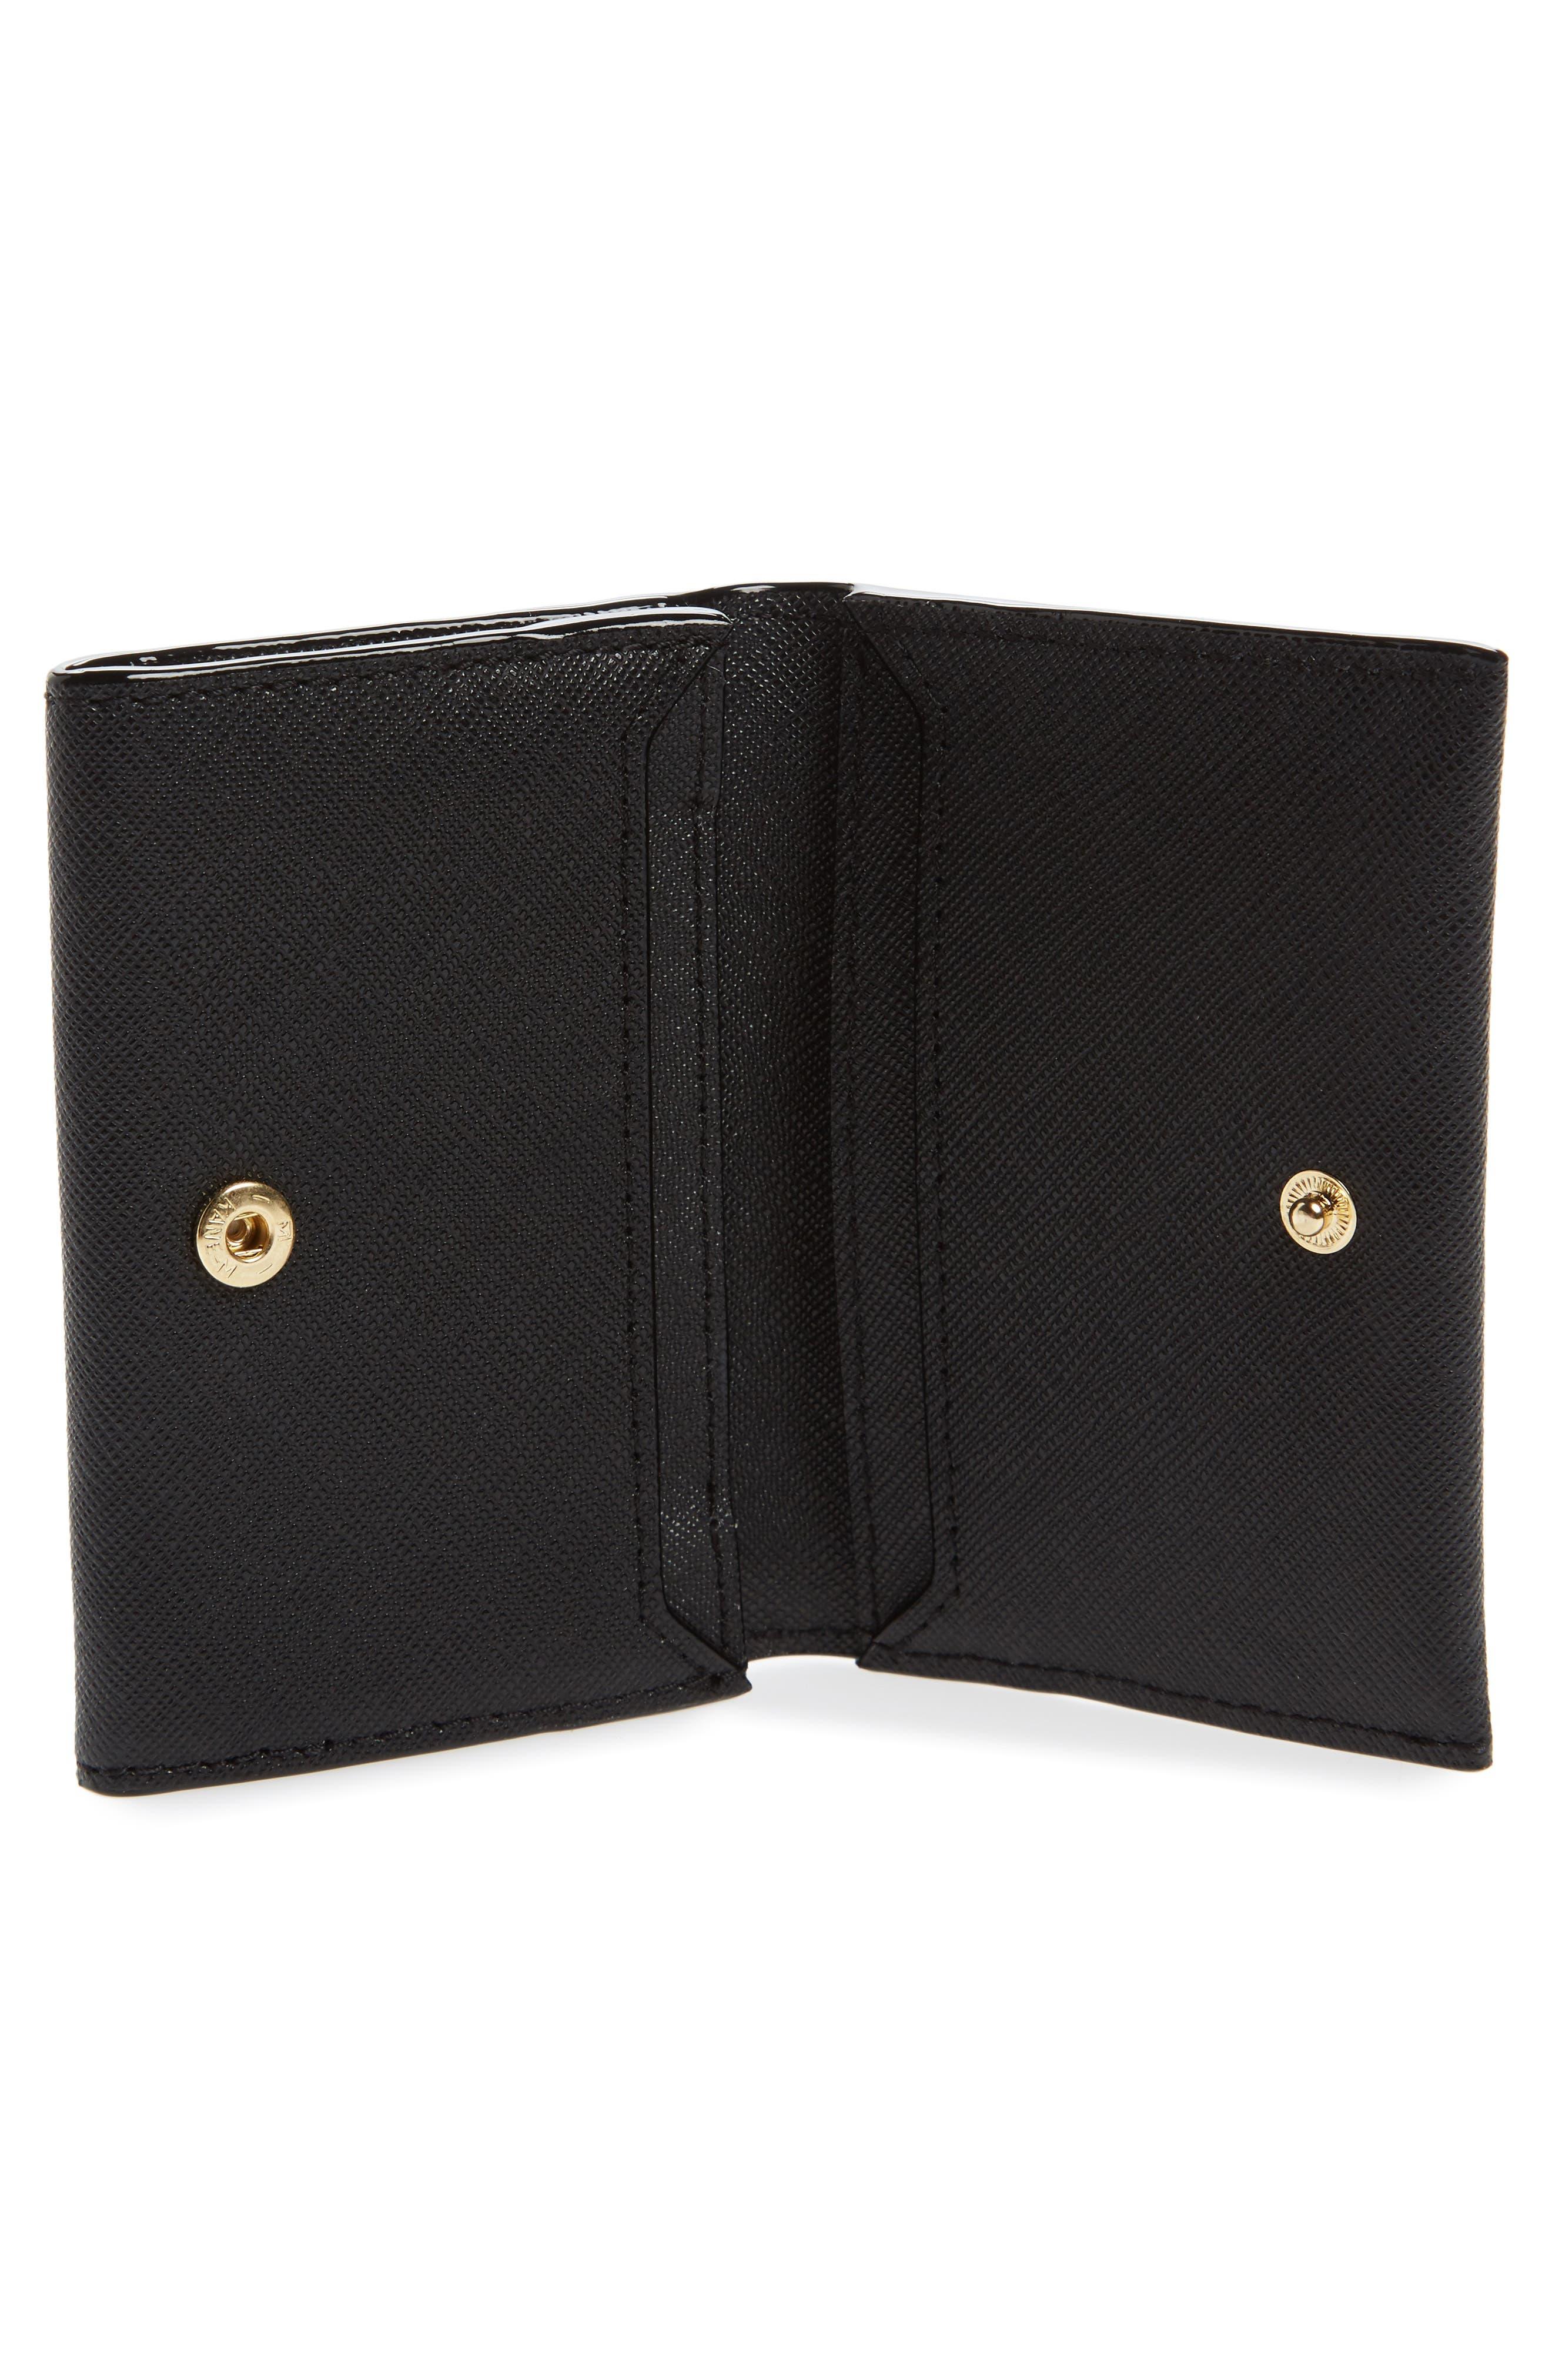 cameron street - farren leather card case,                             Alternate thumbnail 4, color,                             001